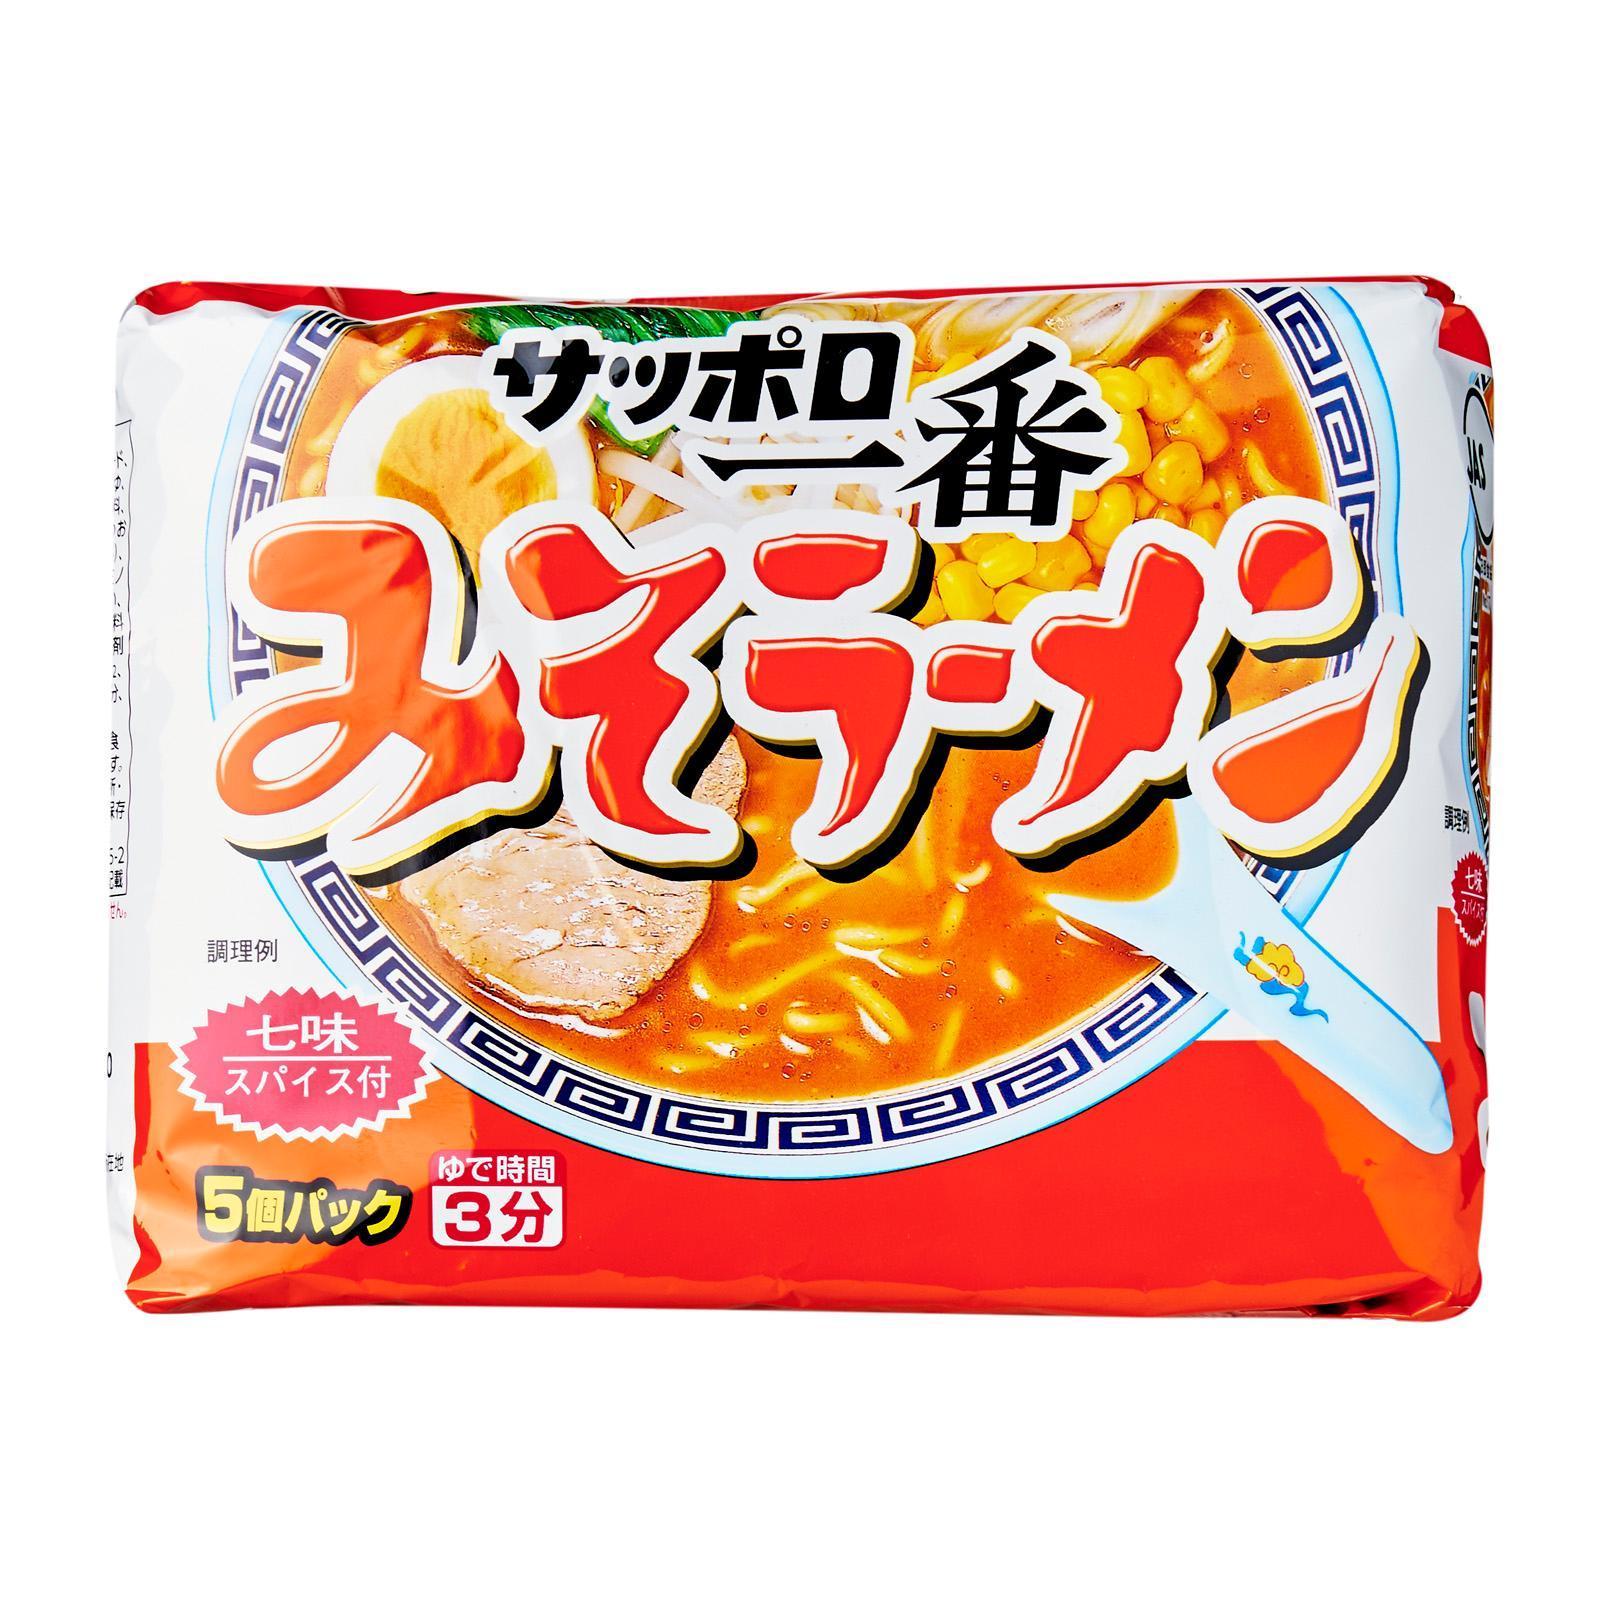 Sapporo Ichiban Miso Ramen Instant Ramen Noodles